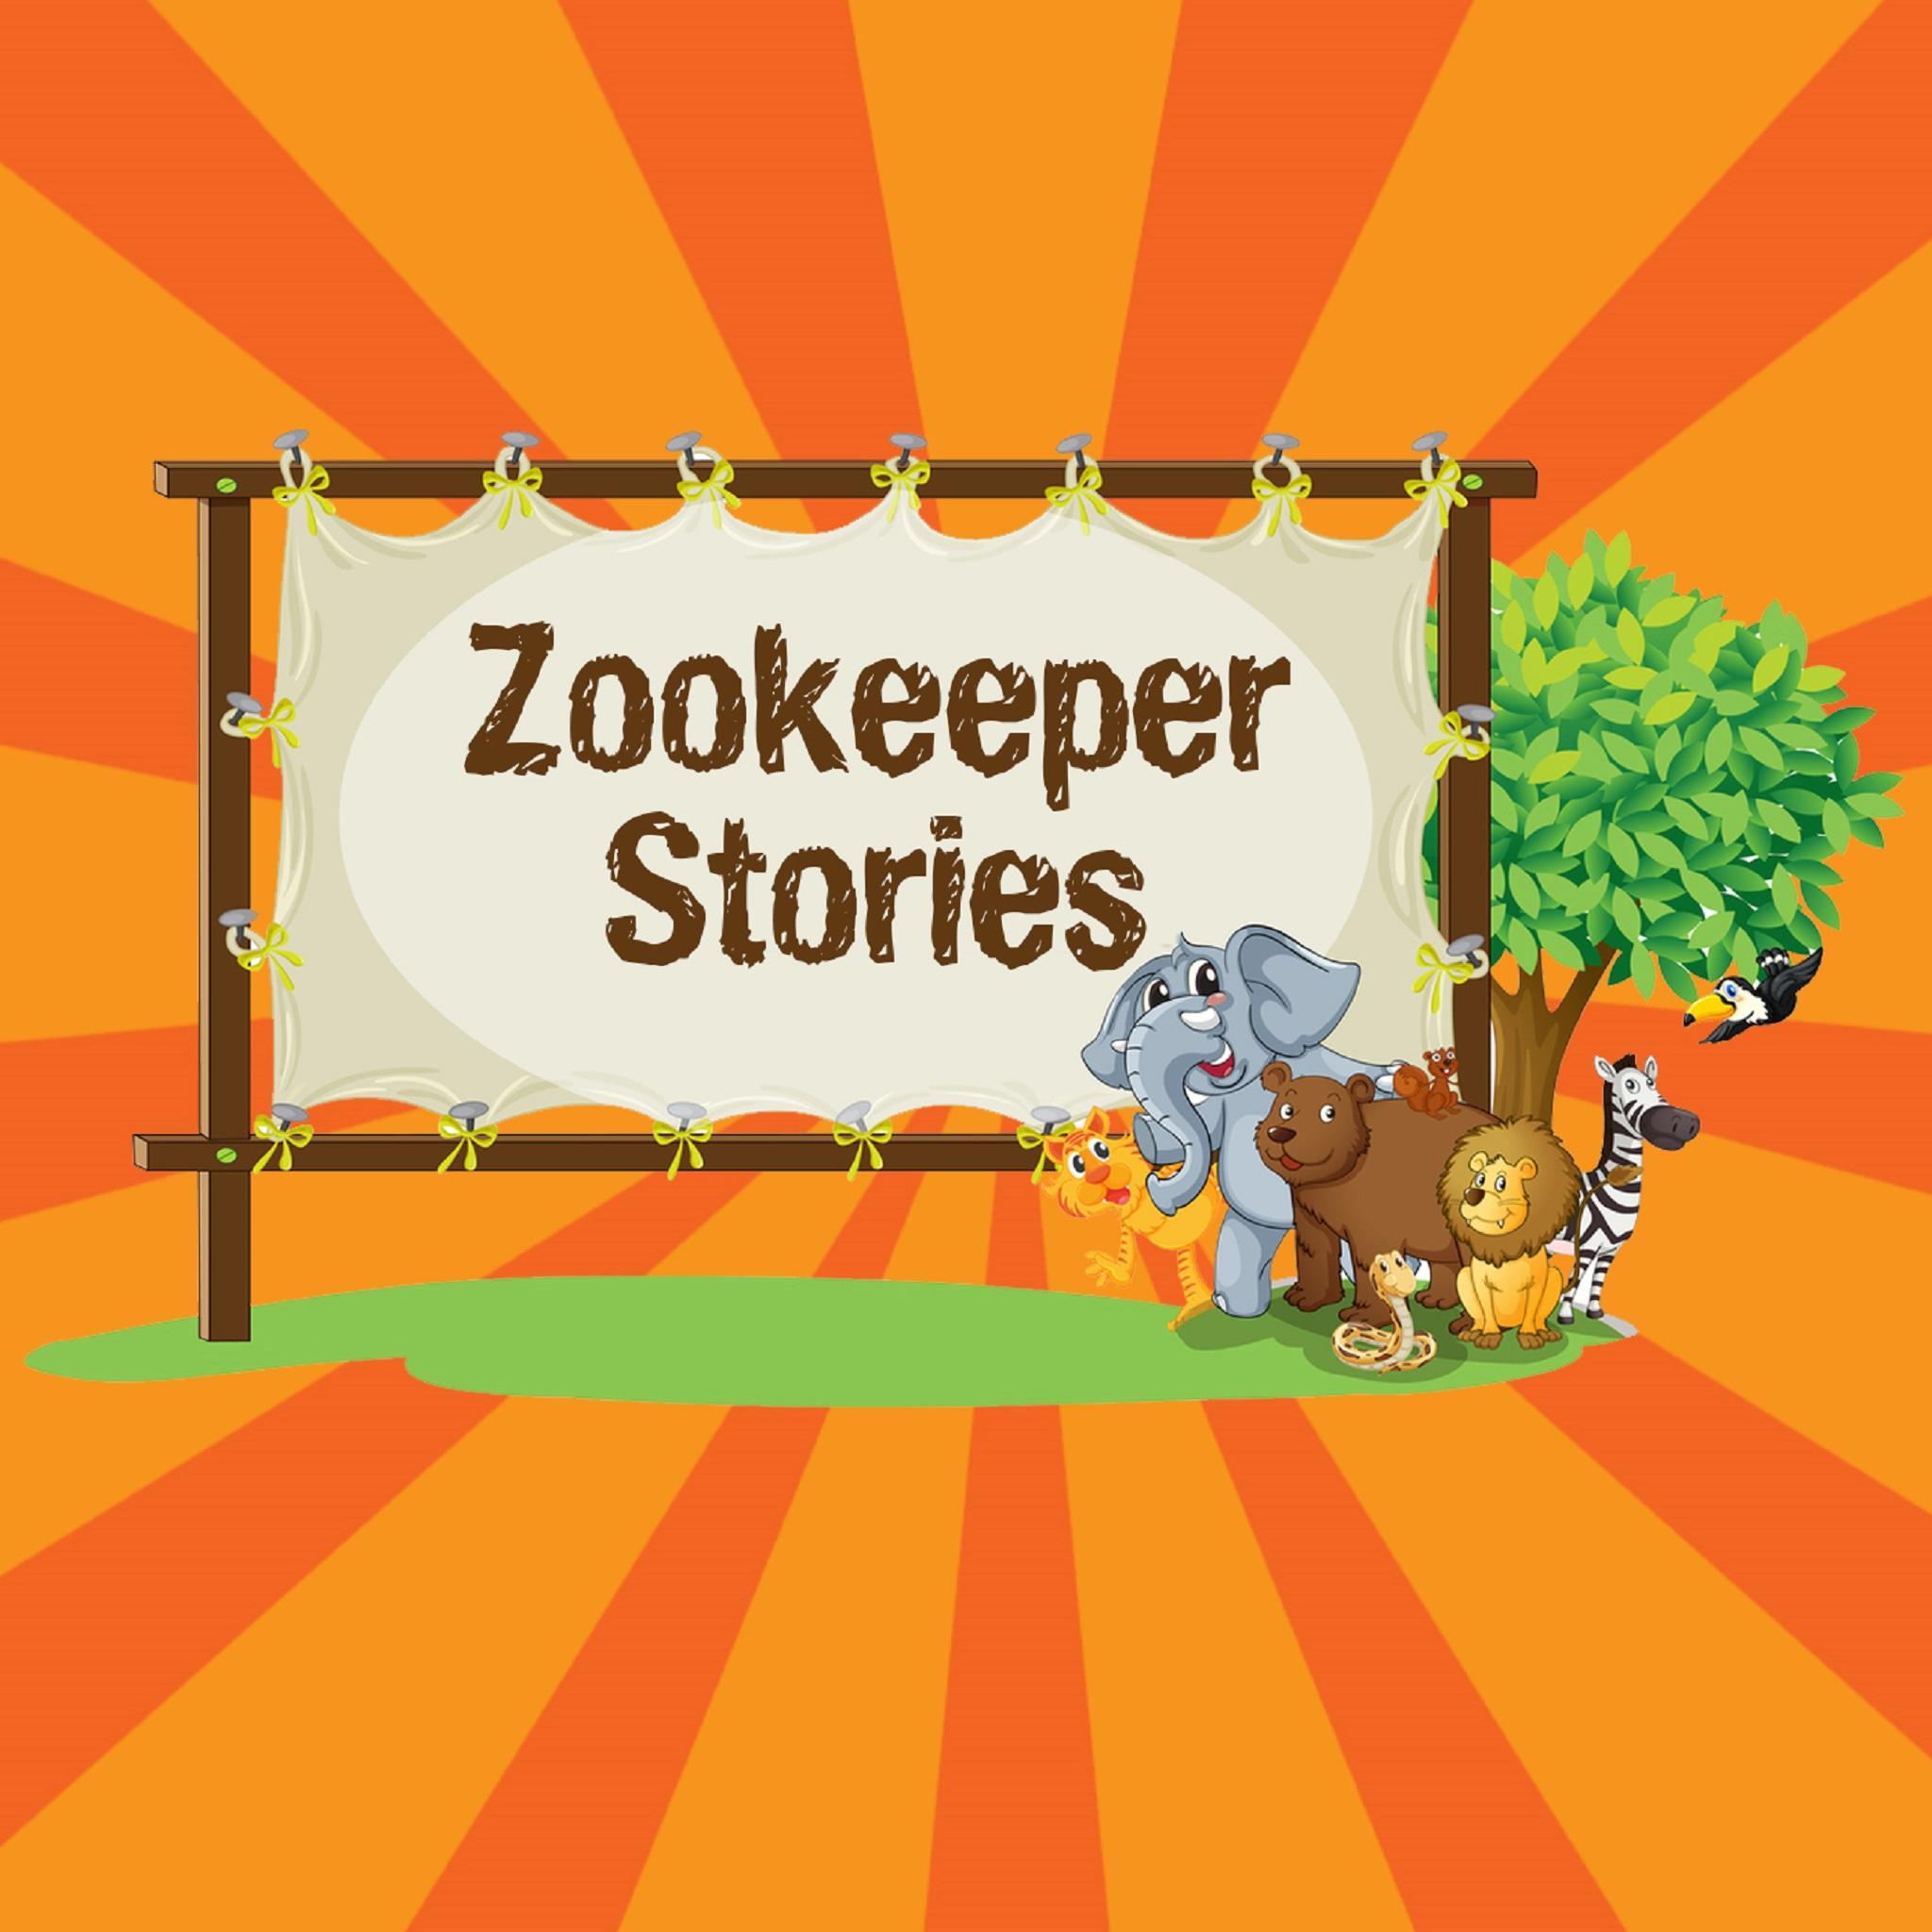 zookeeper stories logo.jpg